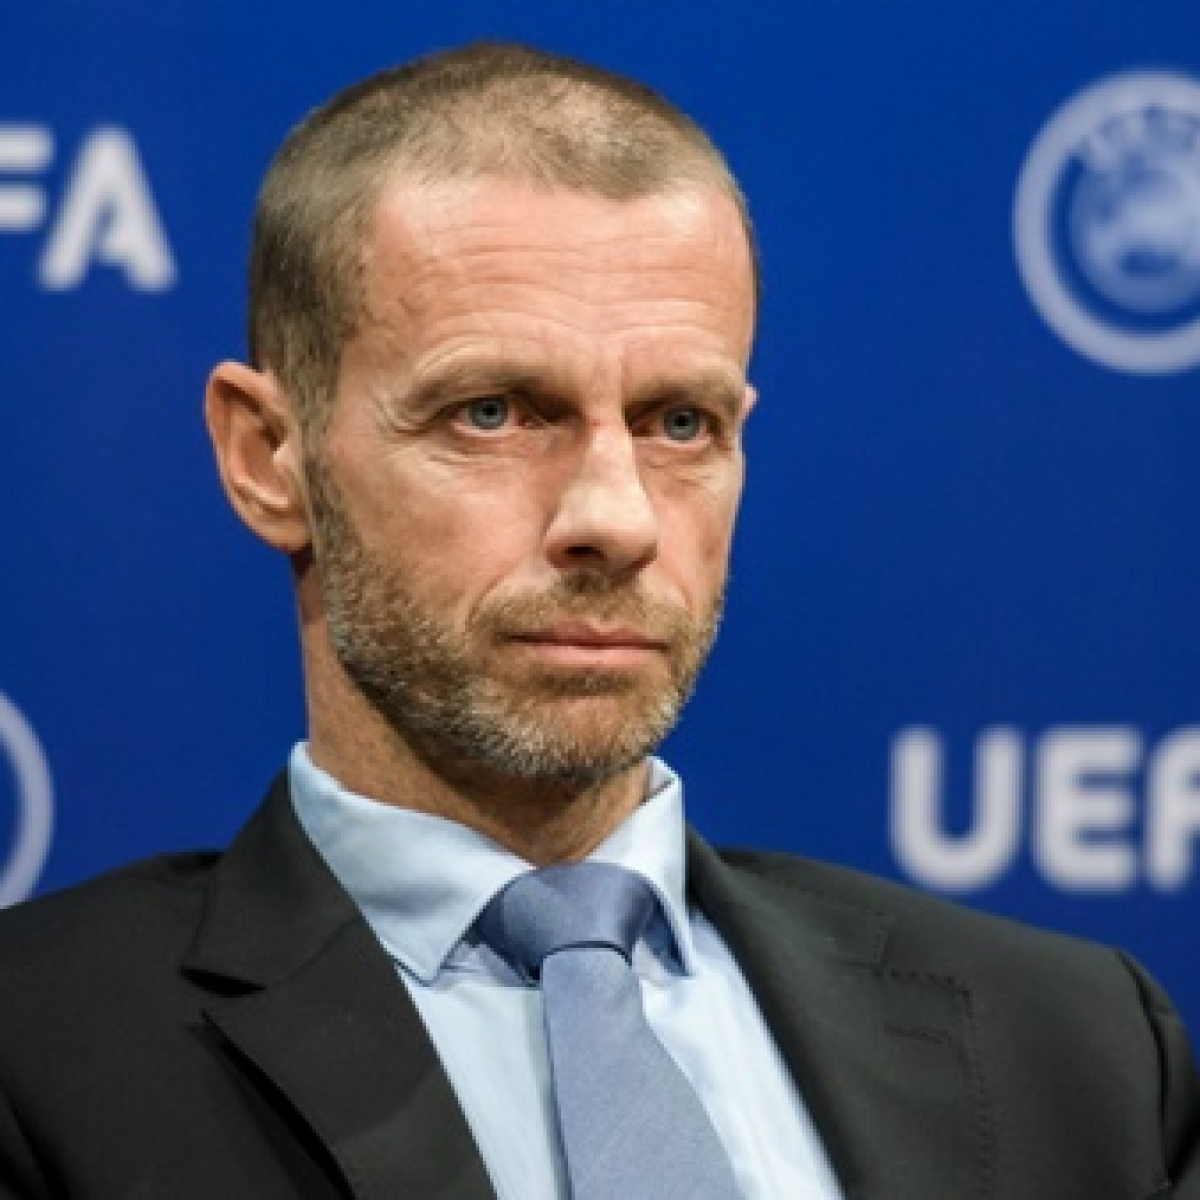 League ready for 'behind closed doors', says UEFA president Aleksander Ceferin